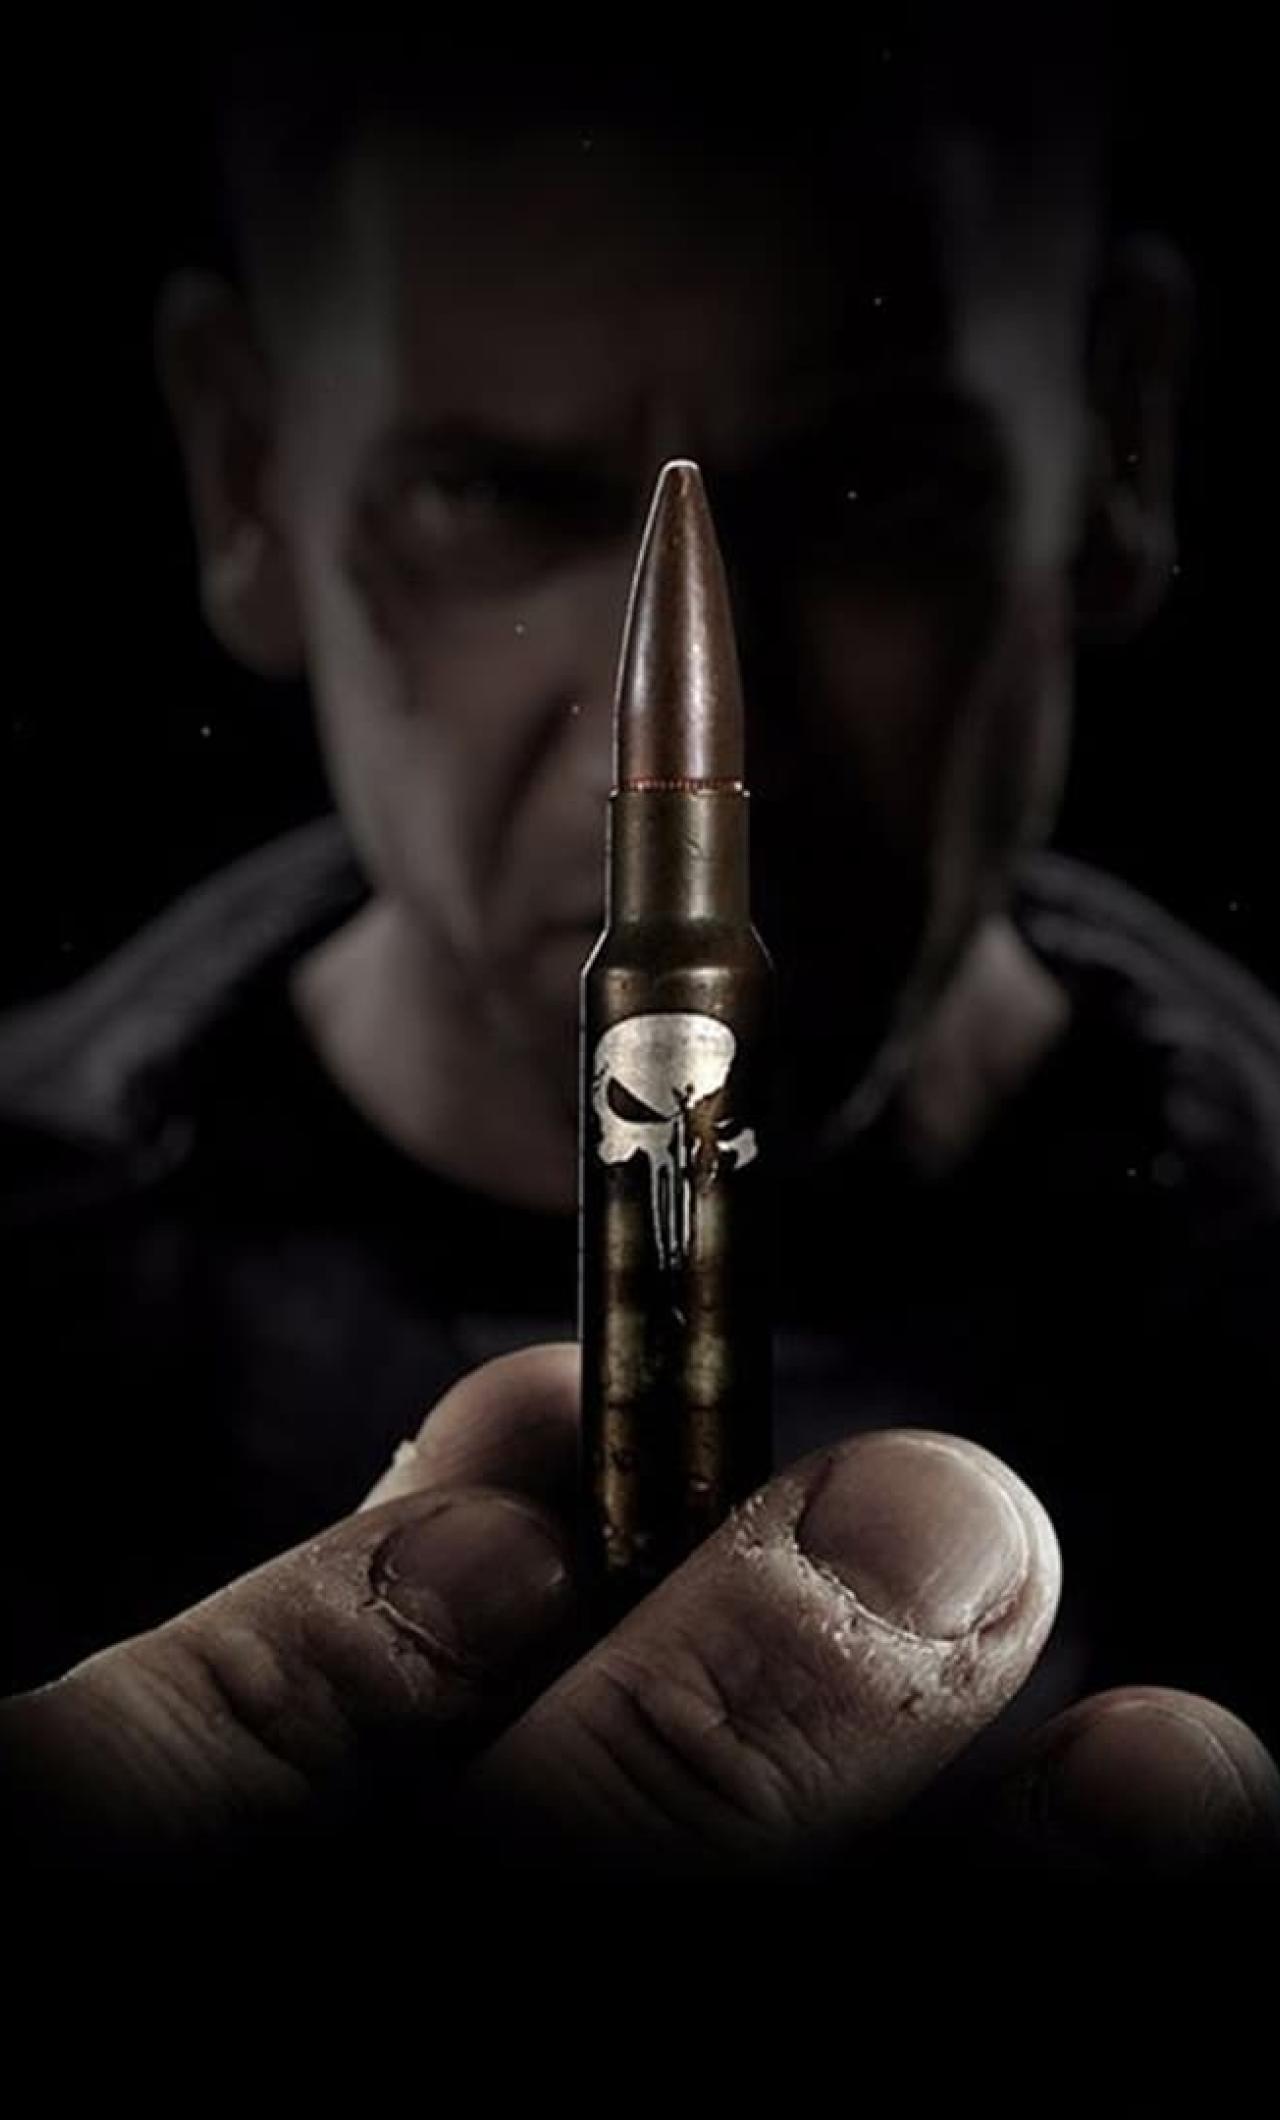 1280x2120 The Punisher Season 2 Iphone 6 Plus Wallpaper Hd Tv